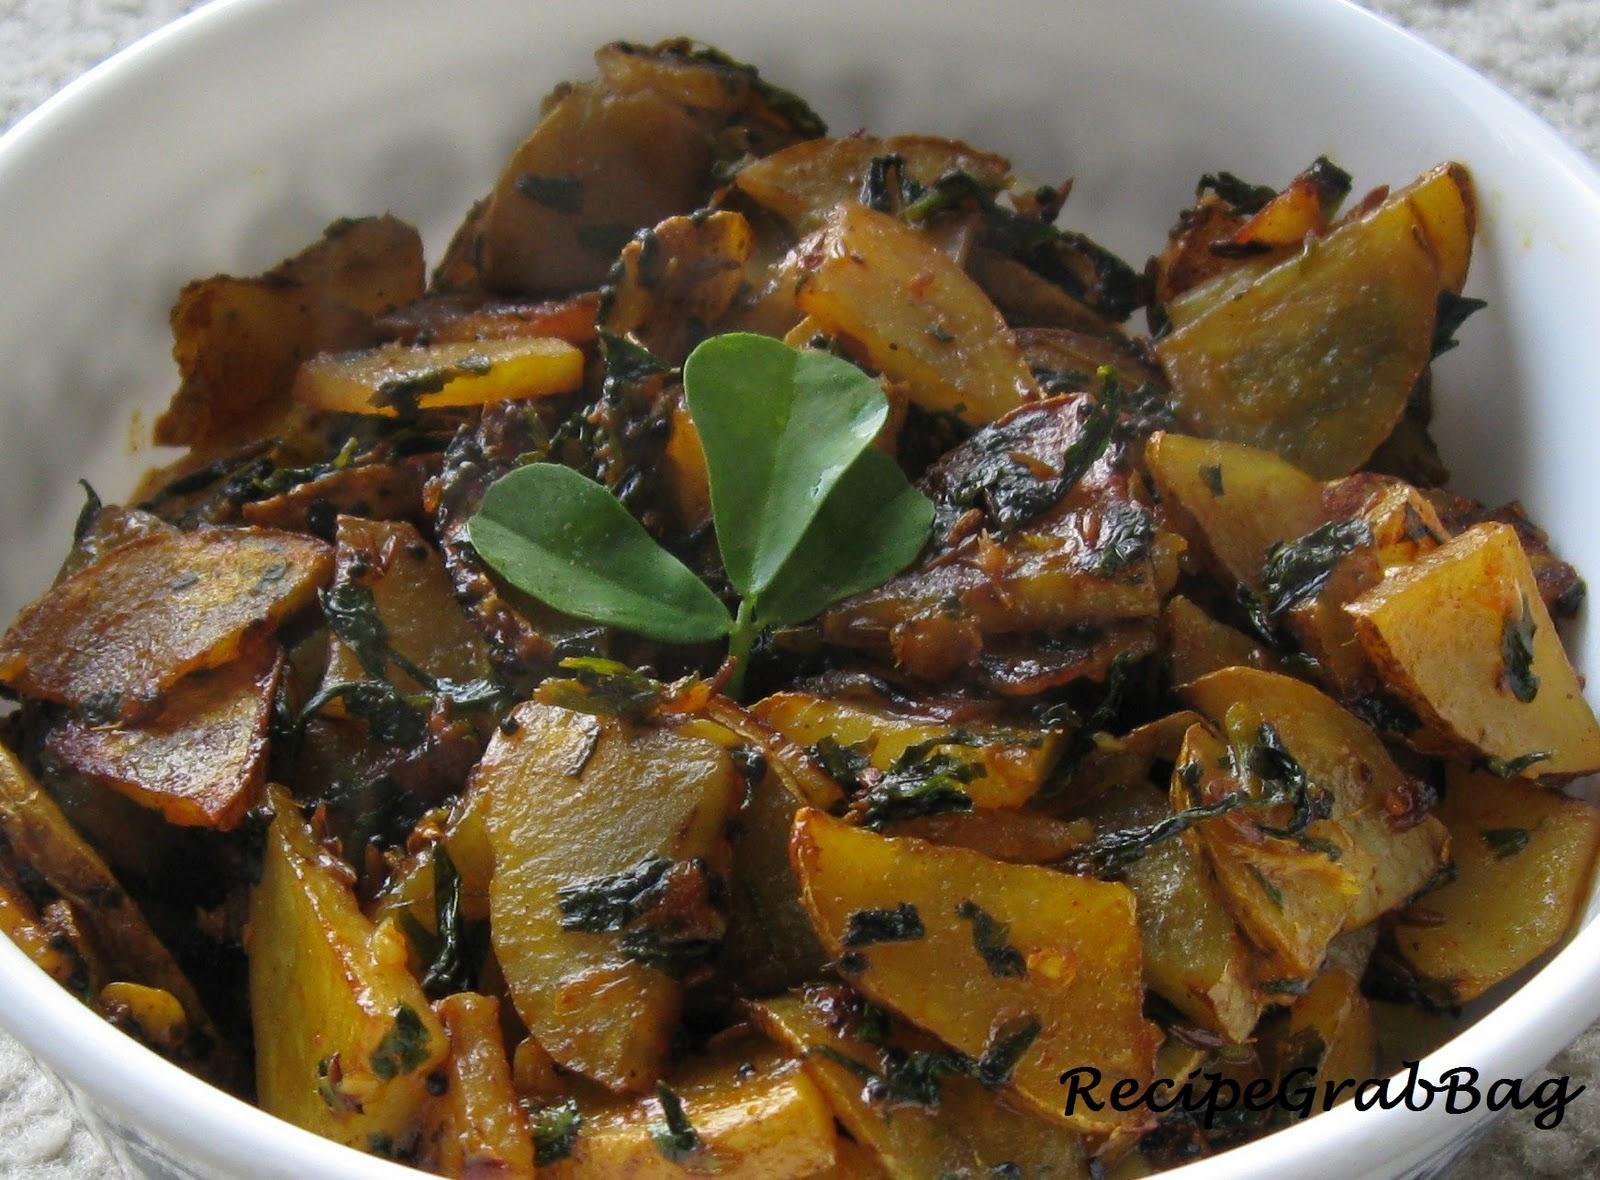 RecipeGrabBag: Methi Batata Bhaji (Potato Fenugreek Vegetable)